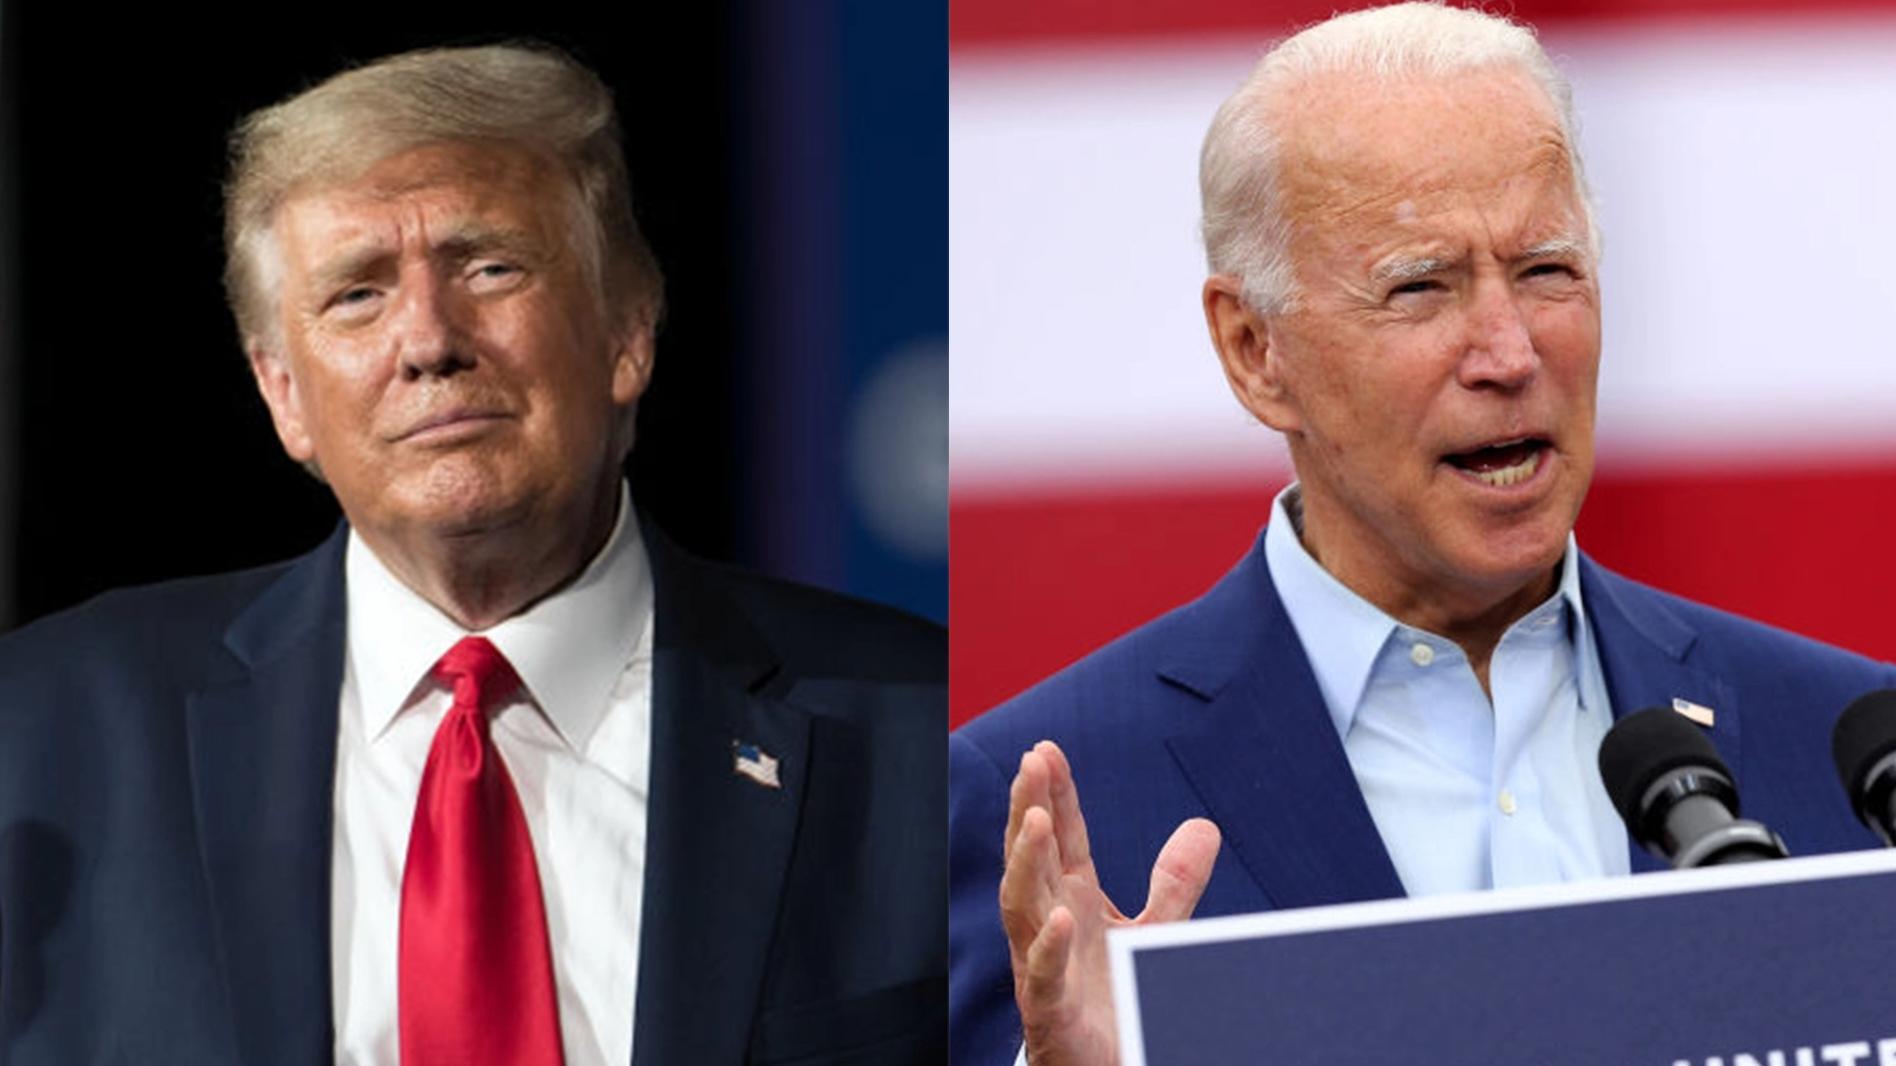 trump bidens upcoming debate in dueling town hall meetings instead of face to face